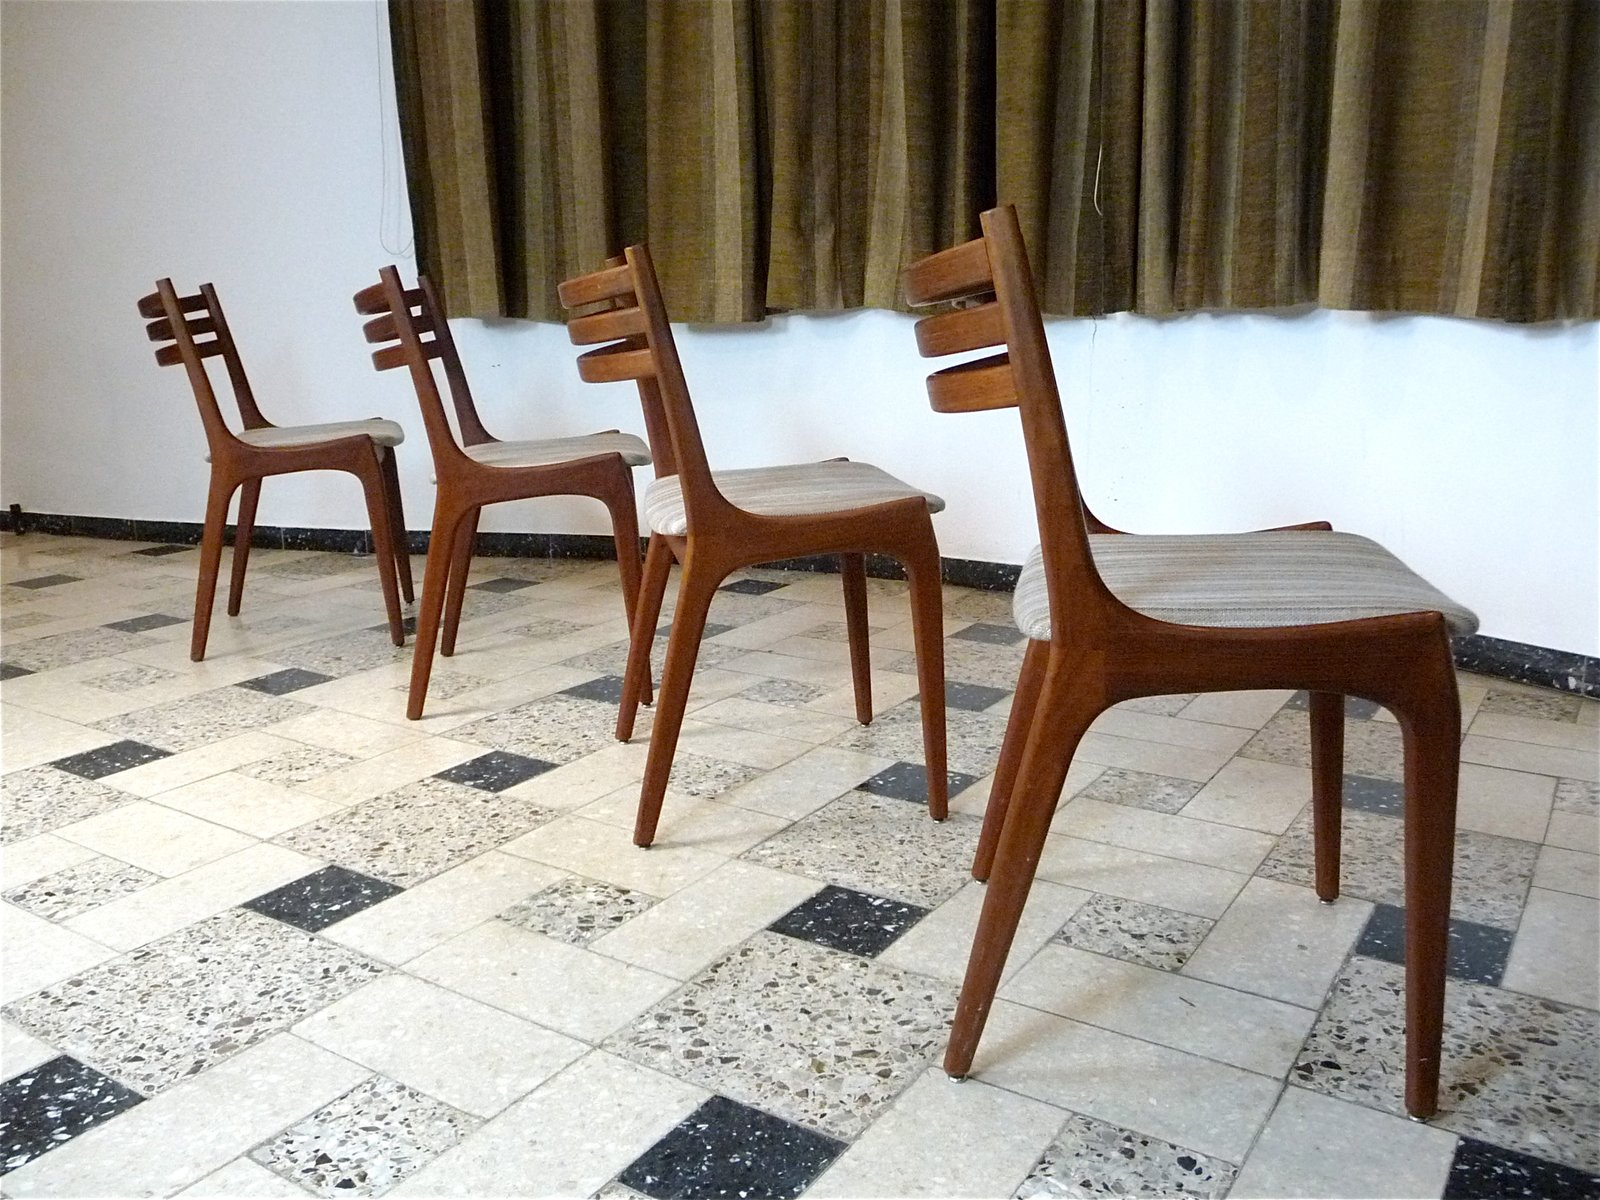 skandinavische teak esszimmerst hle 1960er 4er set bei pamono kaufen. Black Bedroom Furniture Sets. Home Design Ideas